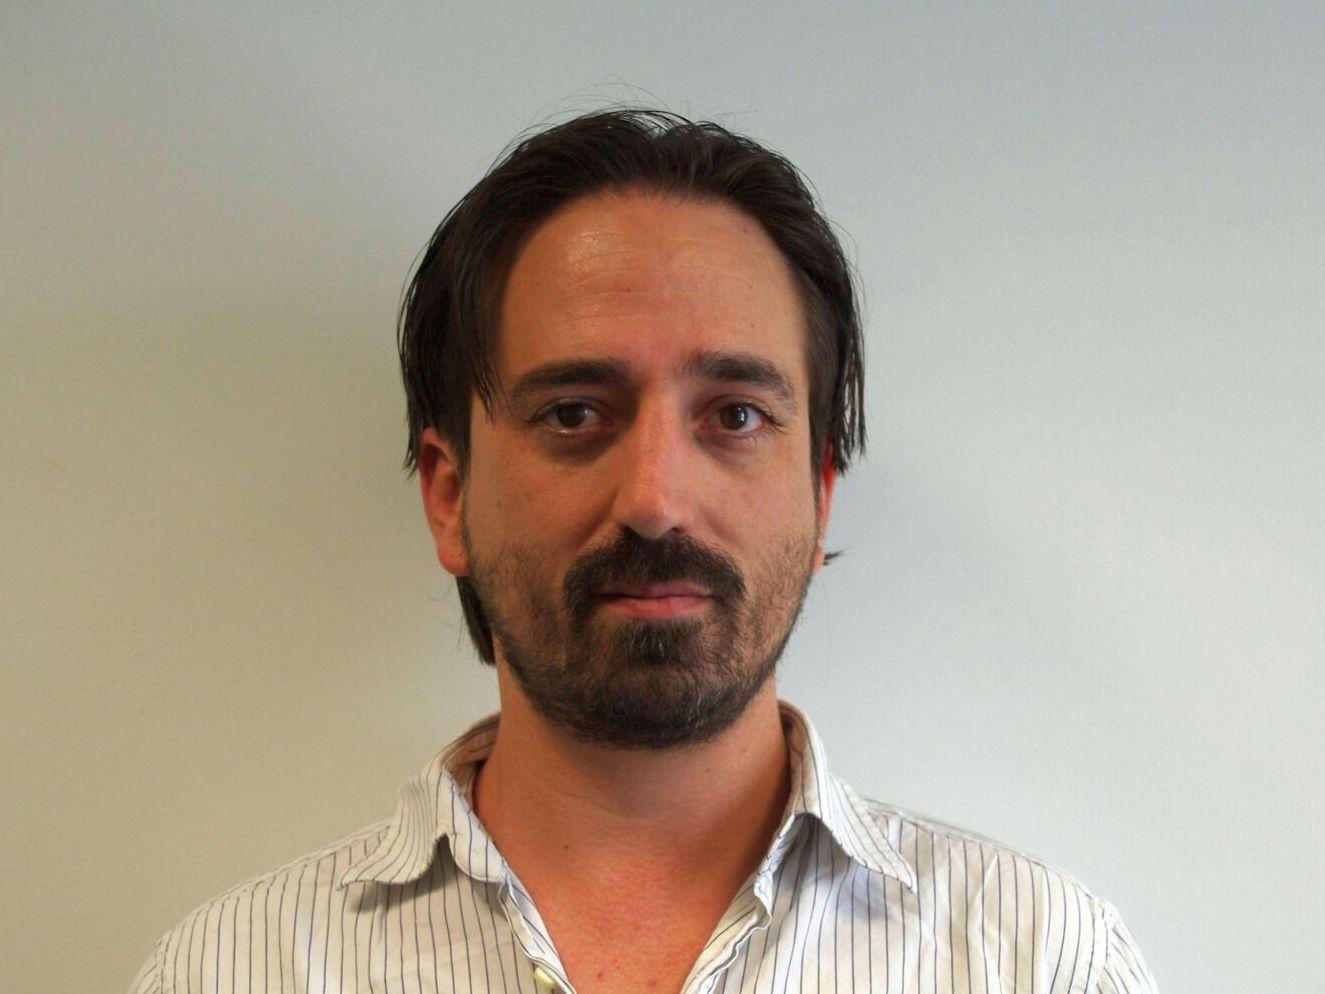 אבנר סנדרוביץ', מהנדס פריסייל בכיר בג'וניפר ישראל. צילום: גלית זאדה